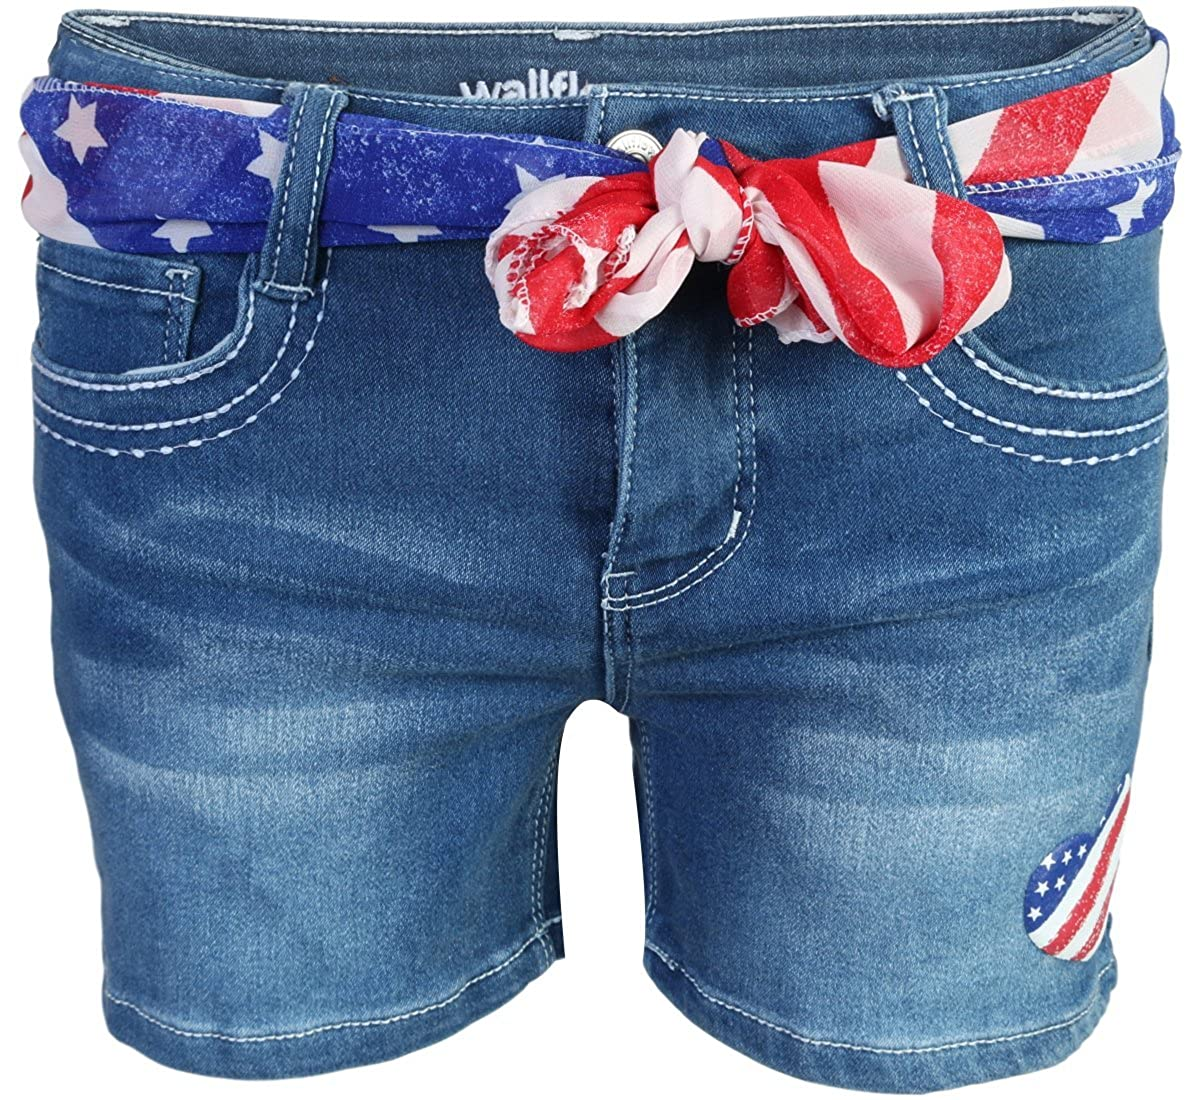 WallFlower Girls Soft Strech Denim Shorts WallFlower Jeans